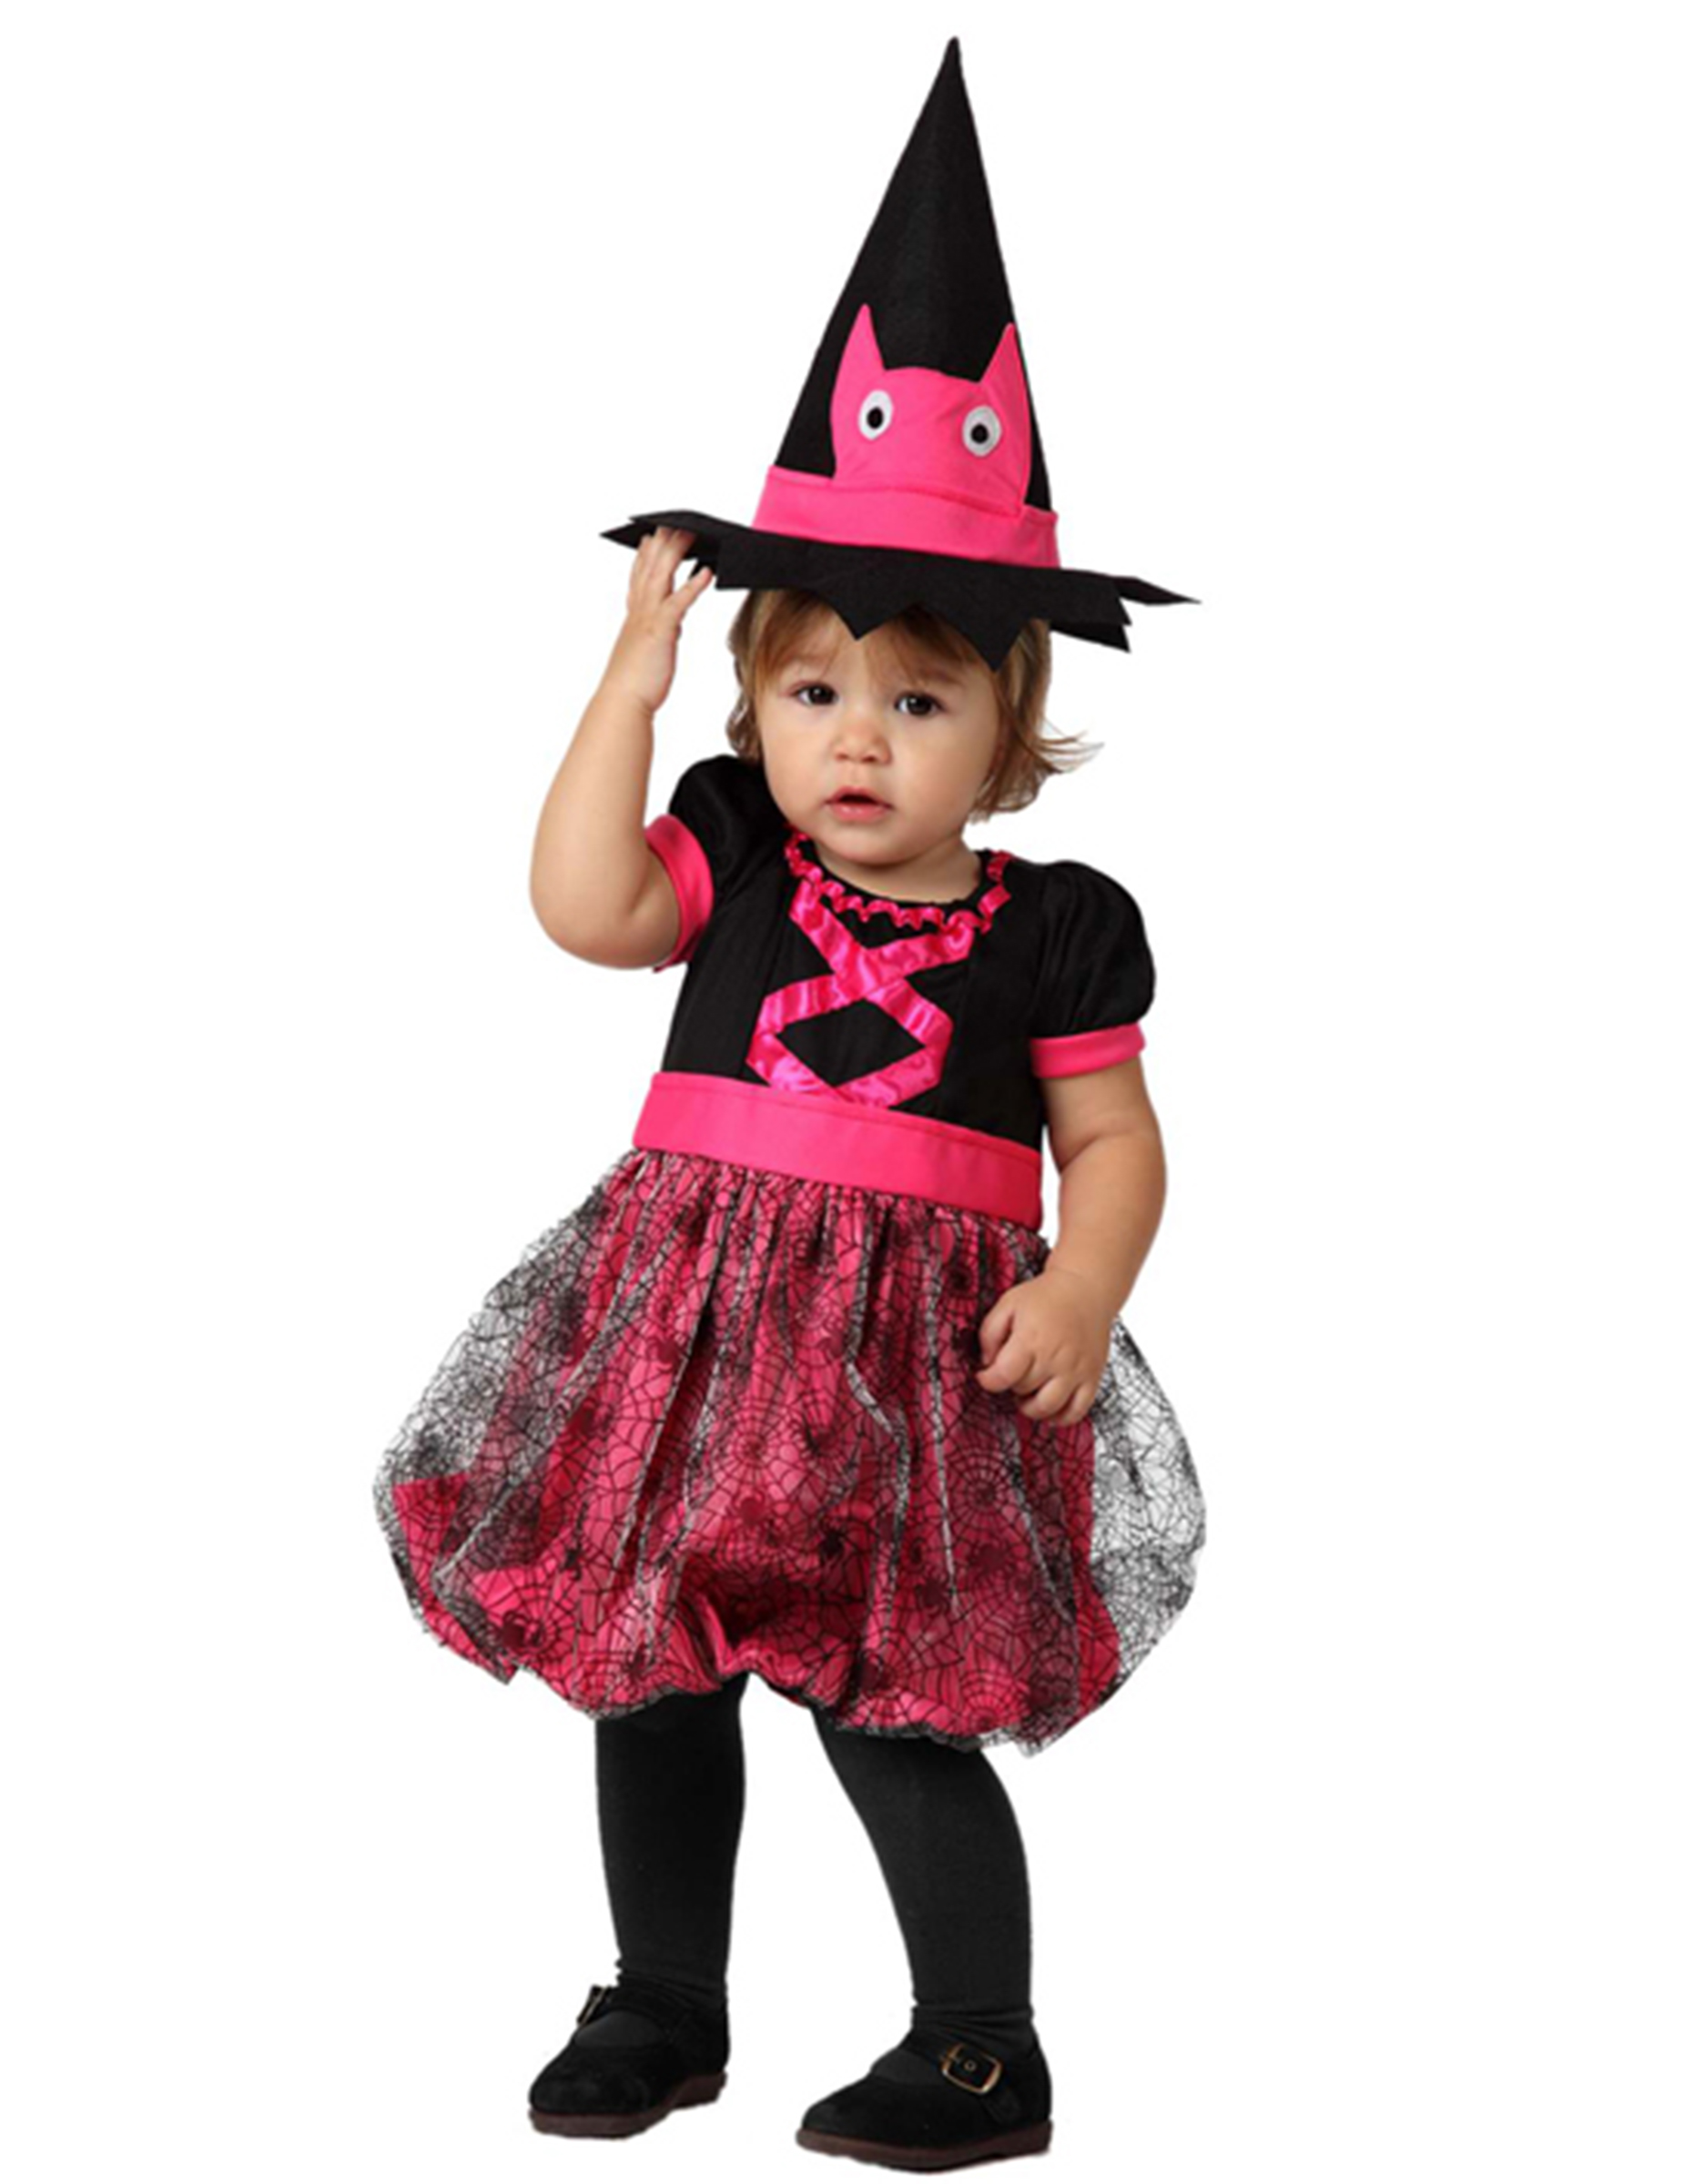 aceff5be73d32 Costume neonata strega rosa halloween  Costumi bambini